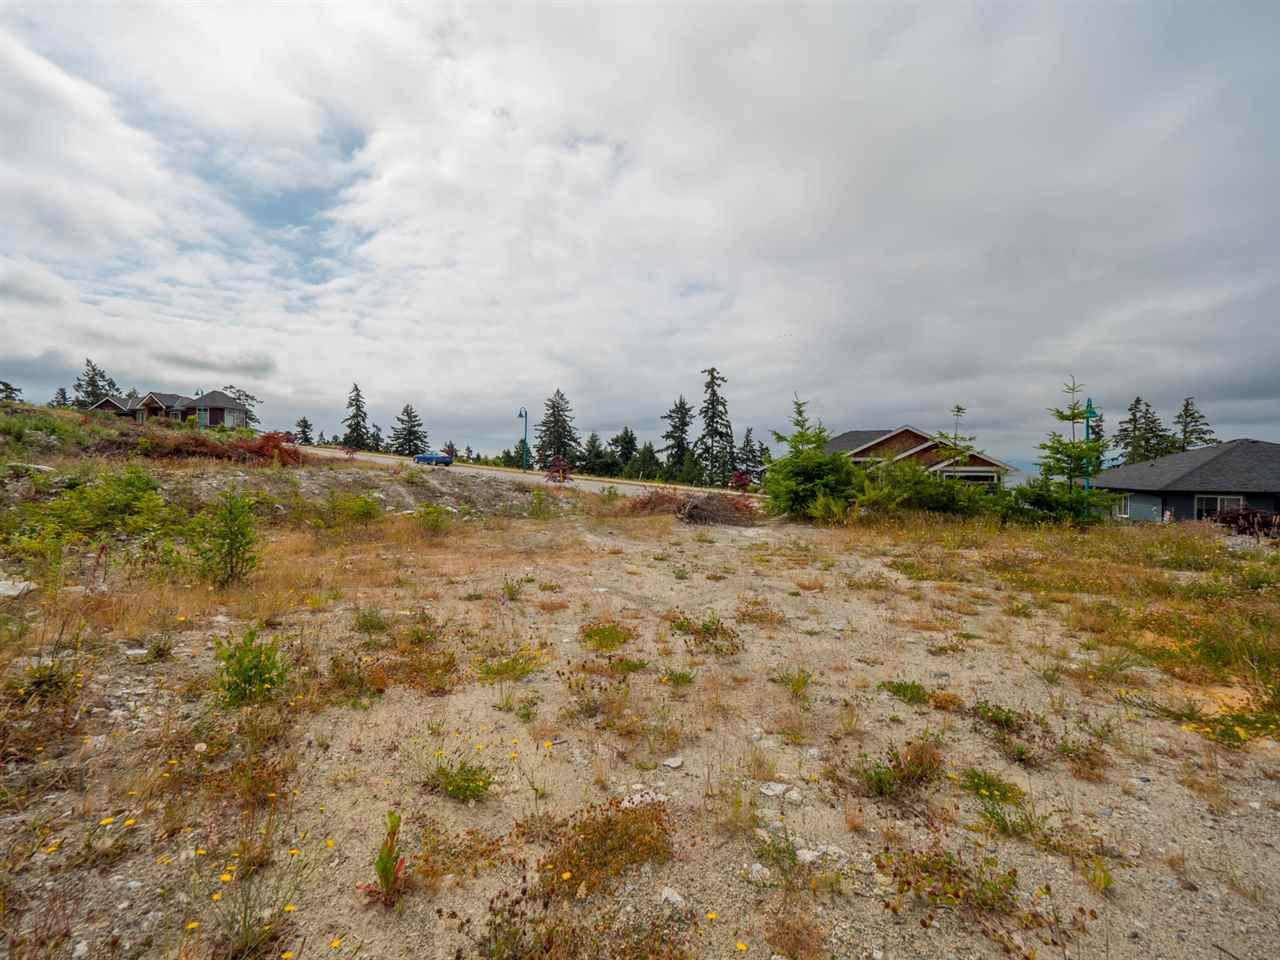 Main Photo: LOT 16 BARNACLE Street in Sechelt: Sechelt District Land for sale (Sunshine Coast)  : MLS®# R2382783